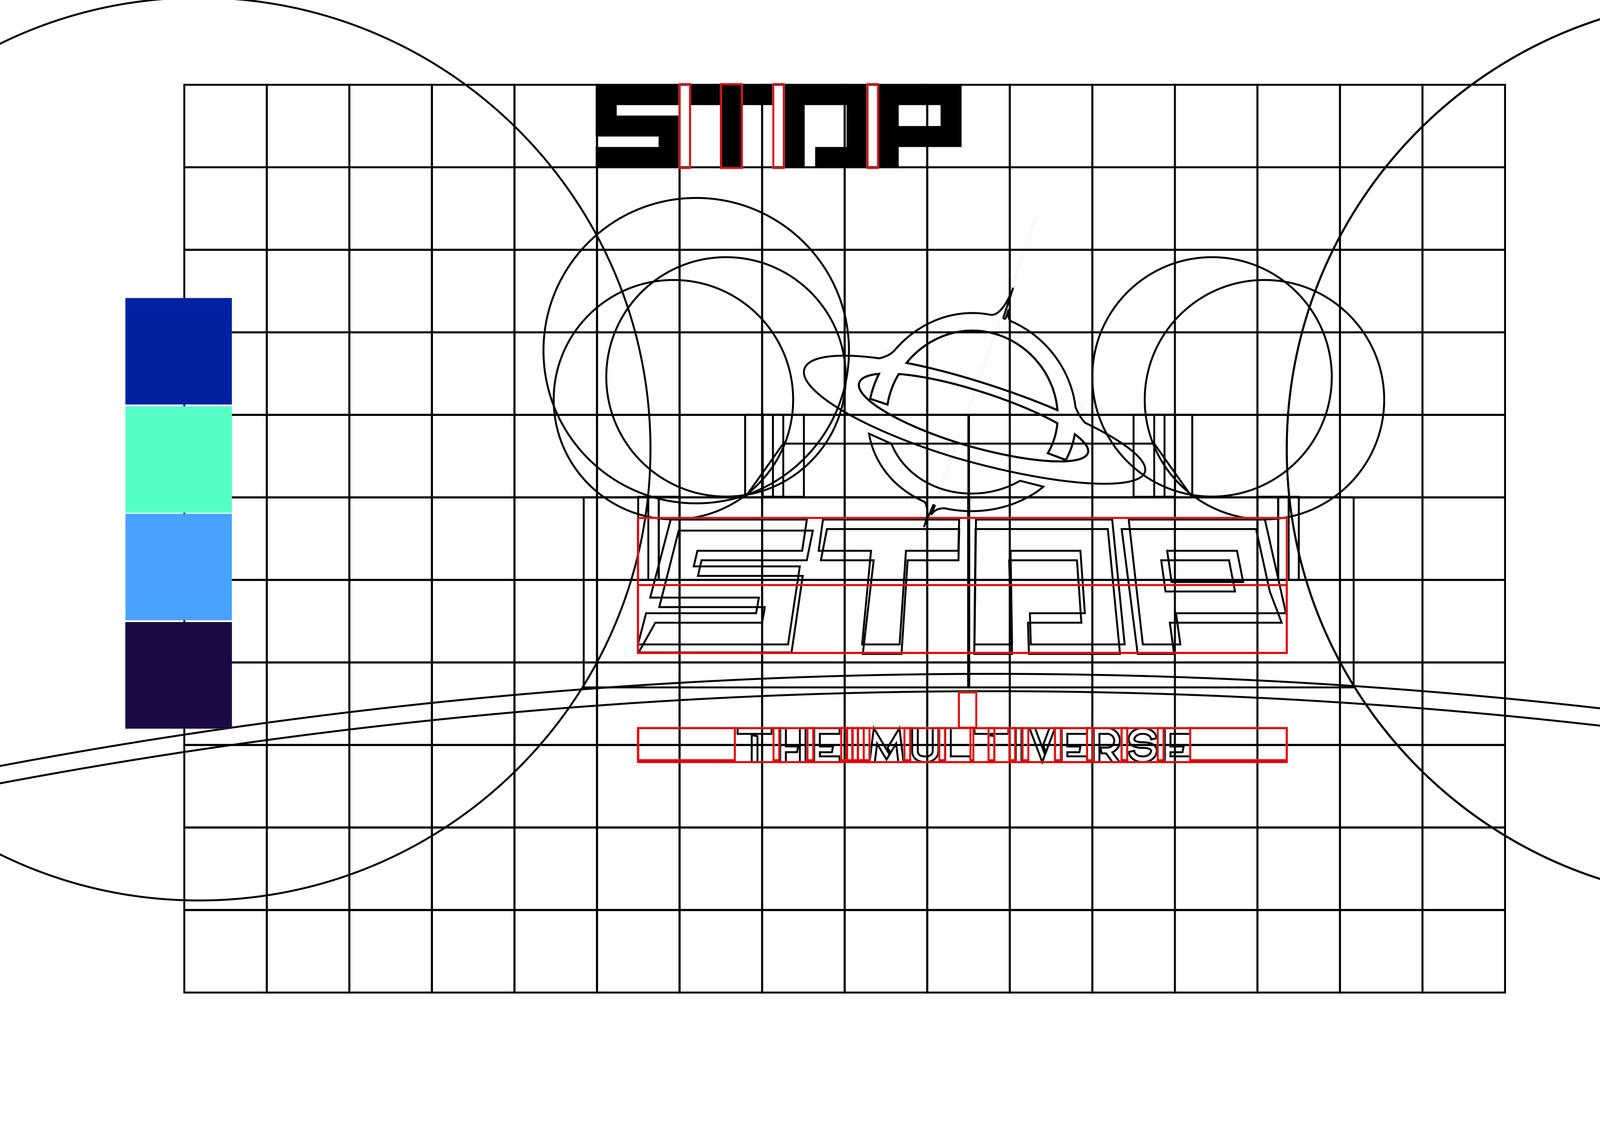 Inicio do projeto de logotipo - Cores e grid.